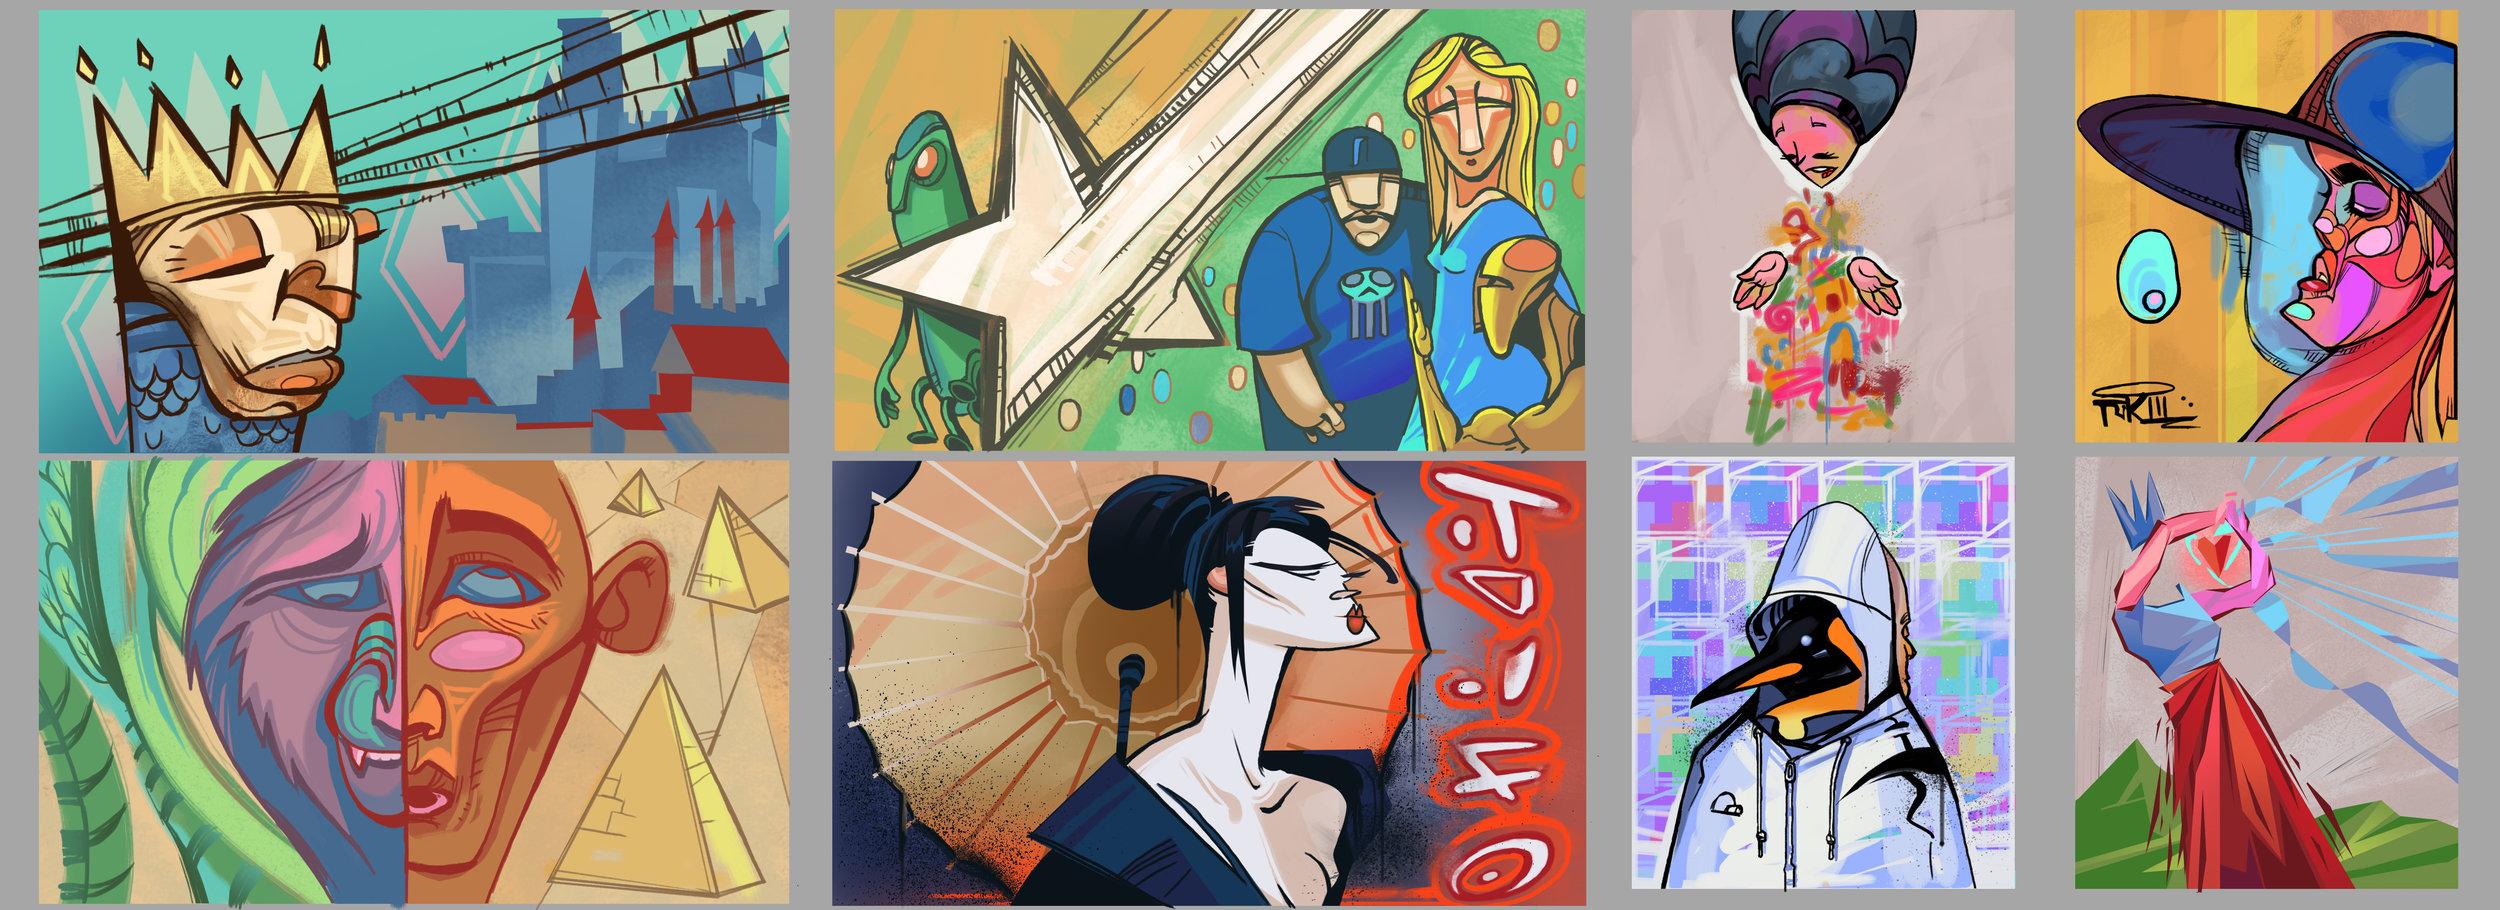 EP03 Wall Murals